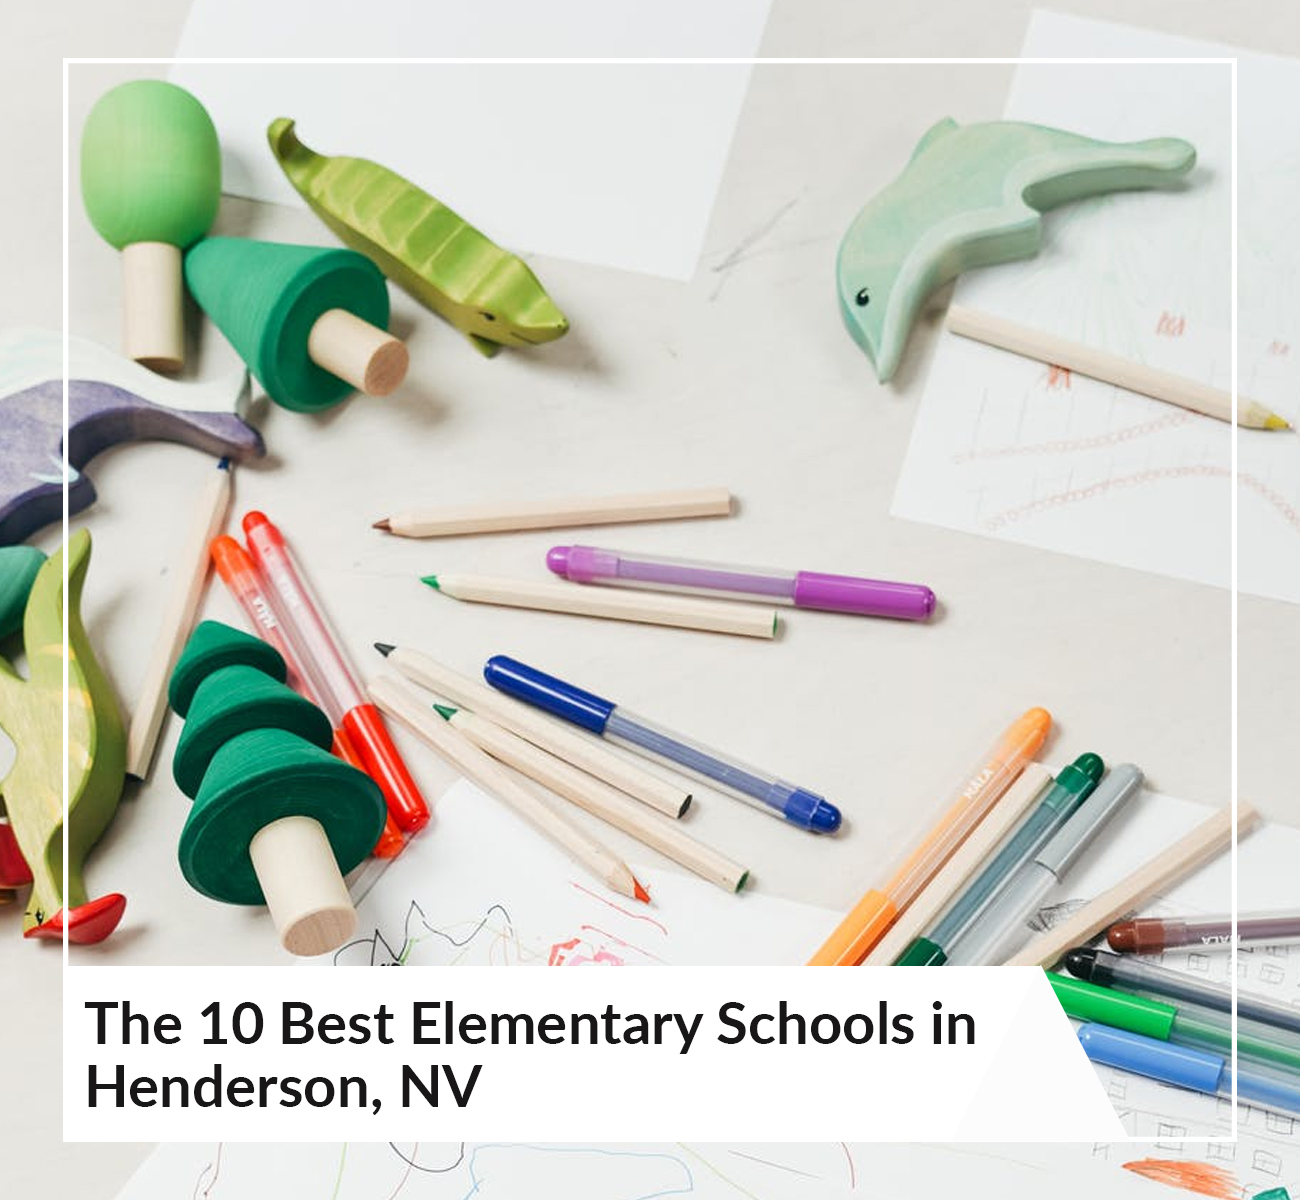 Best Elementary Schools in Henderson